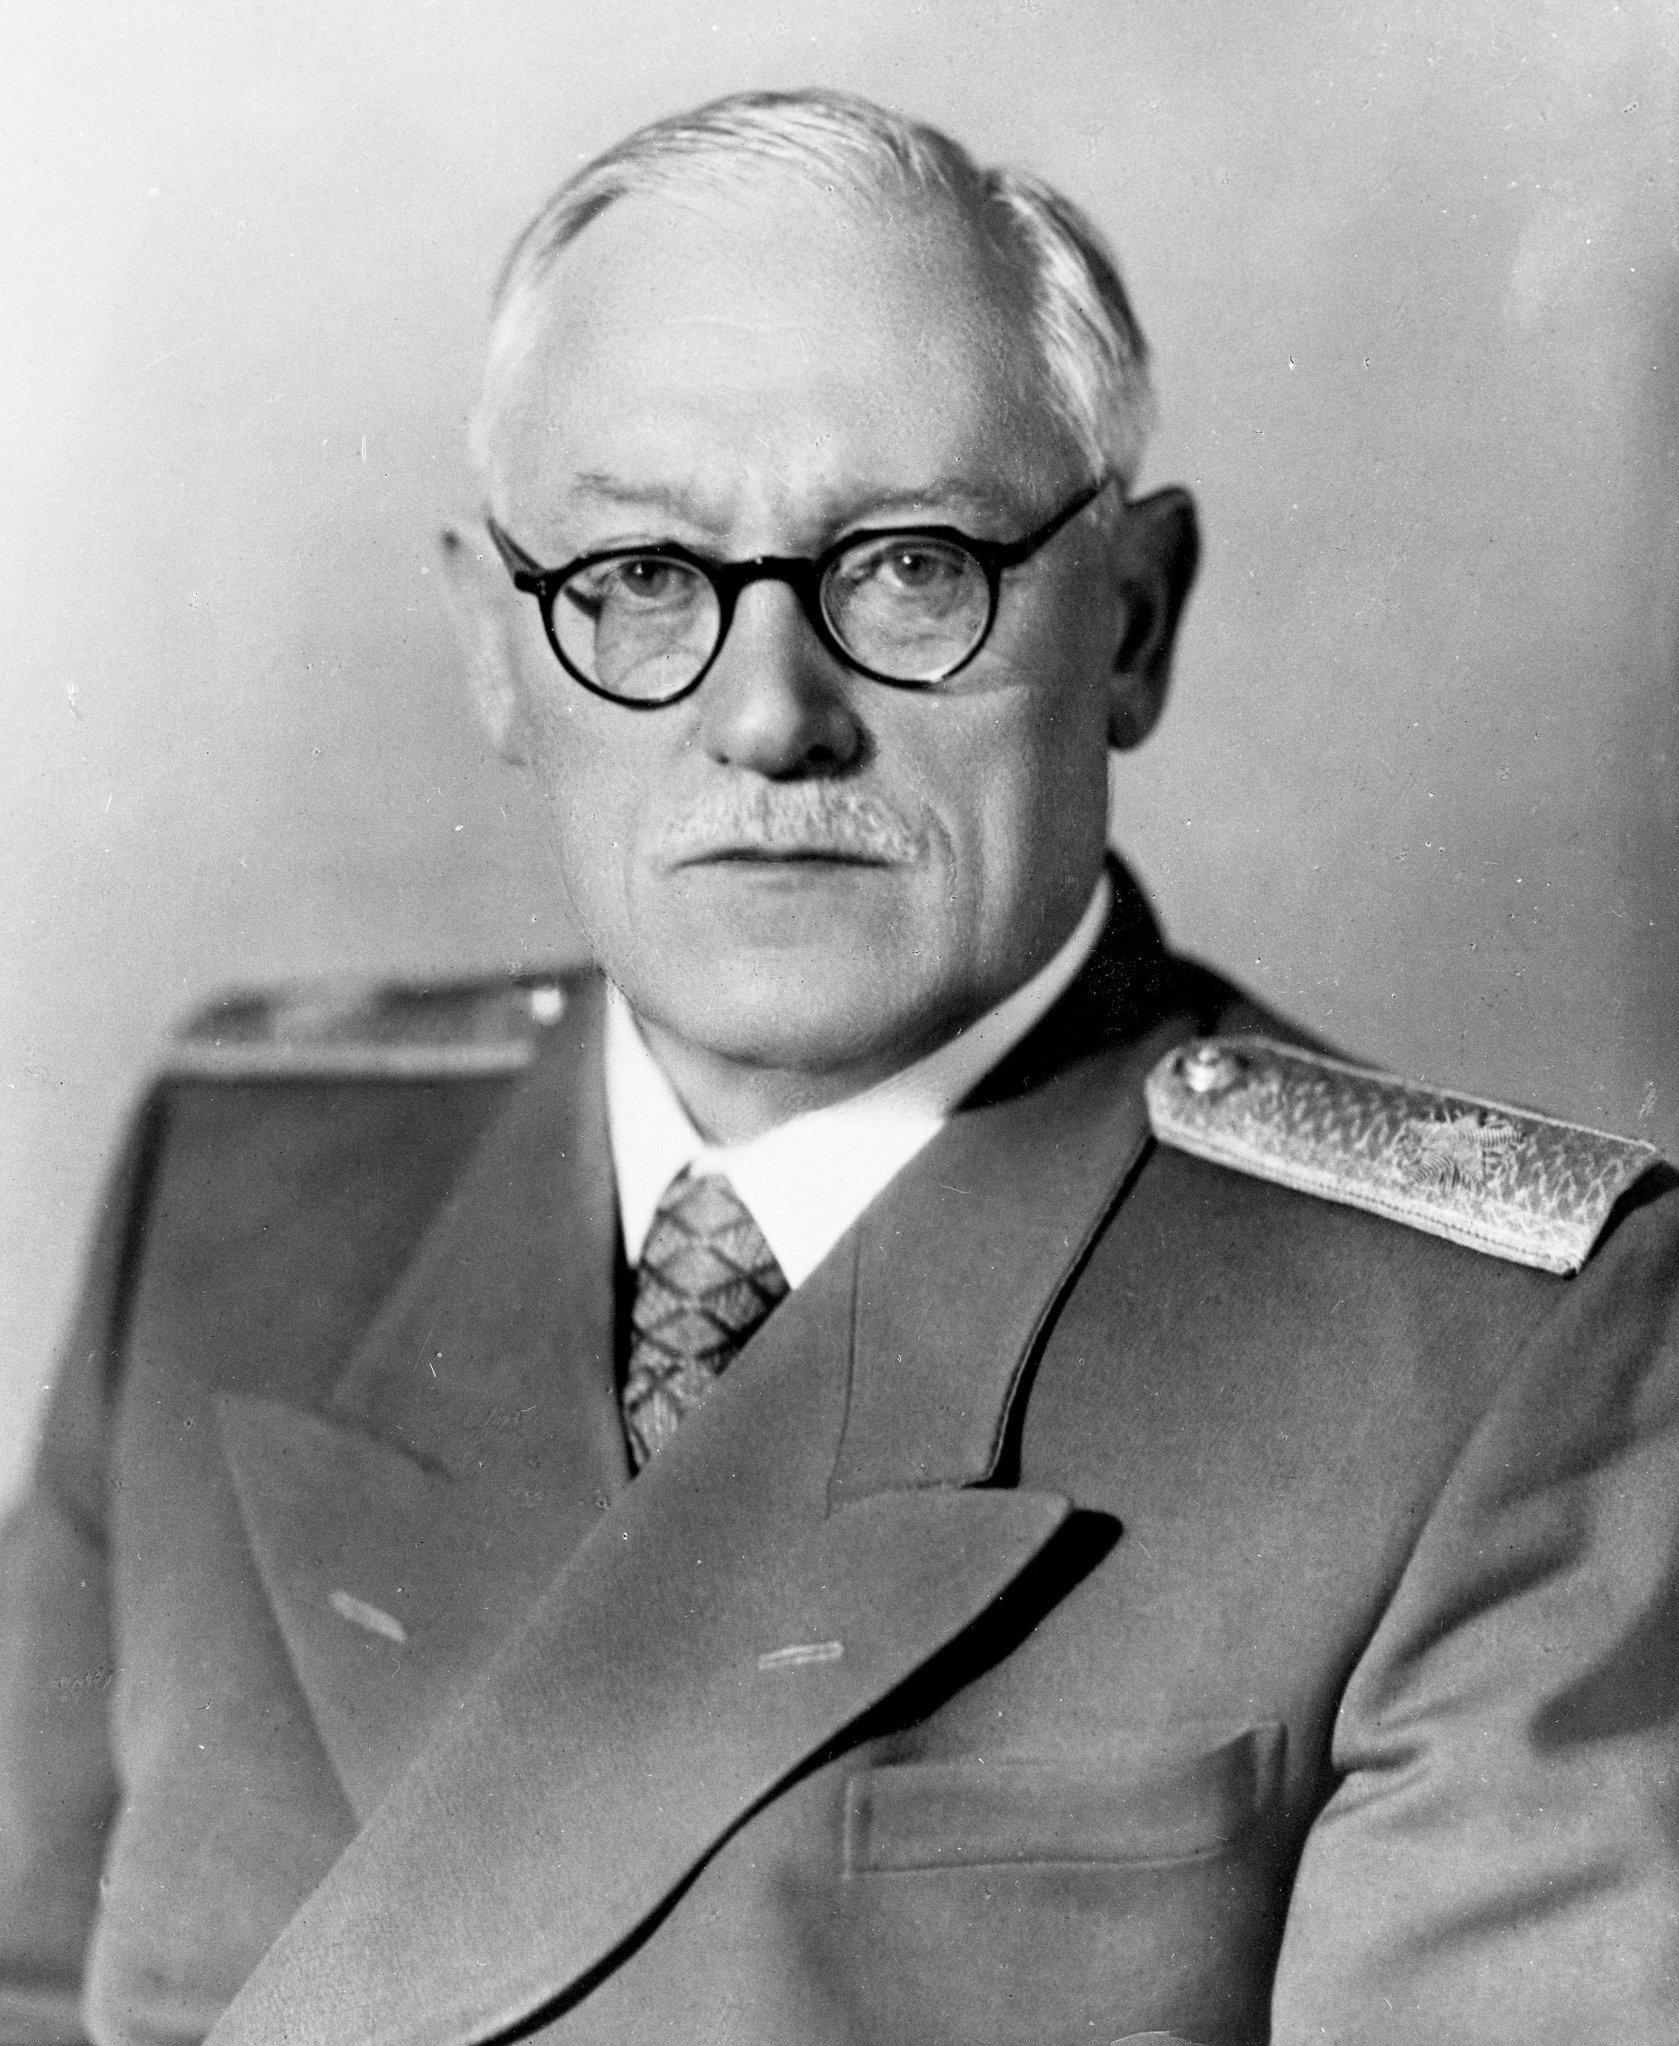 Andrej Vyšinskij (1883 - 1954) ministro degli affari esteri dell'URSS